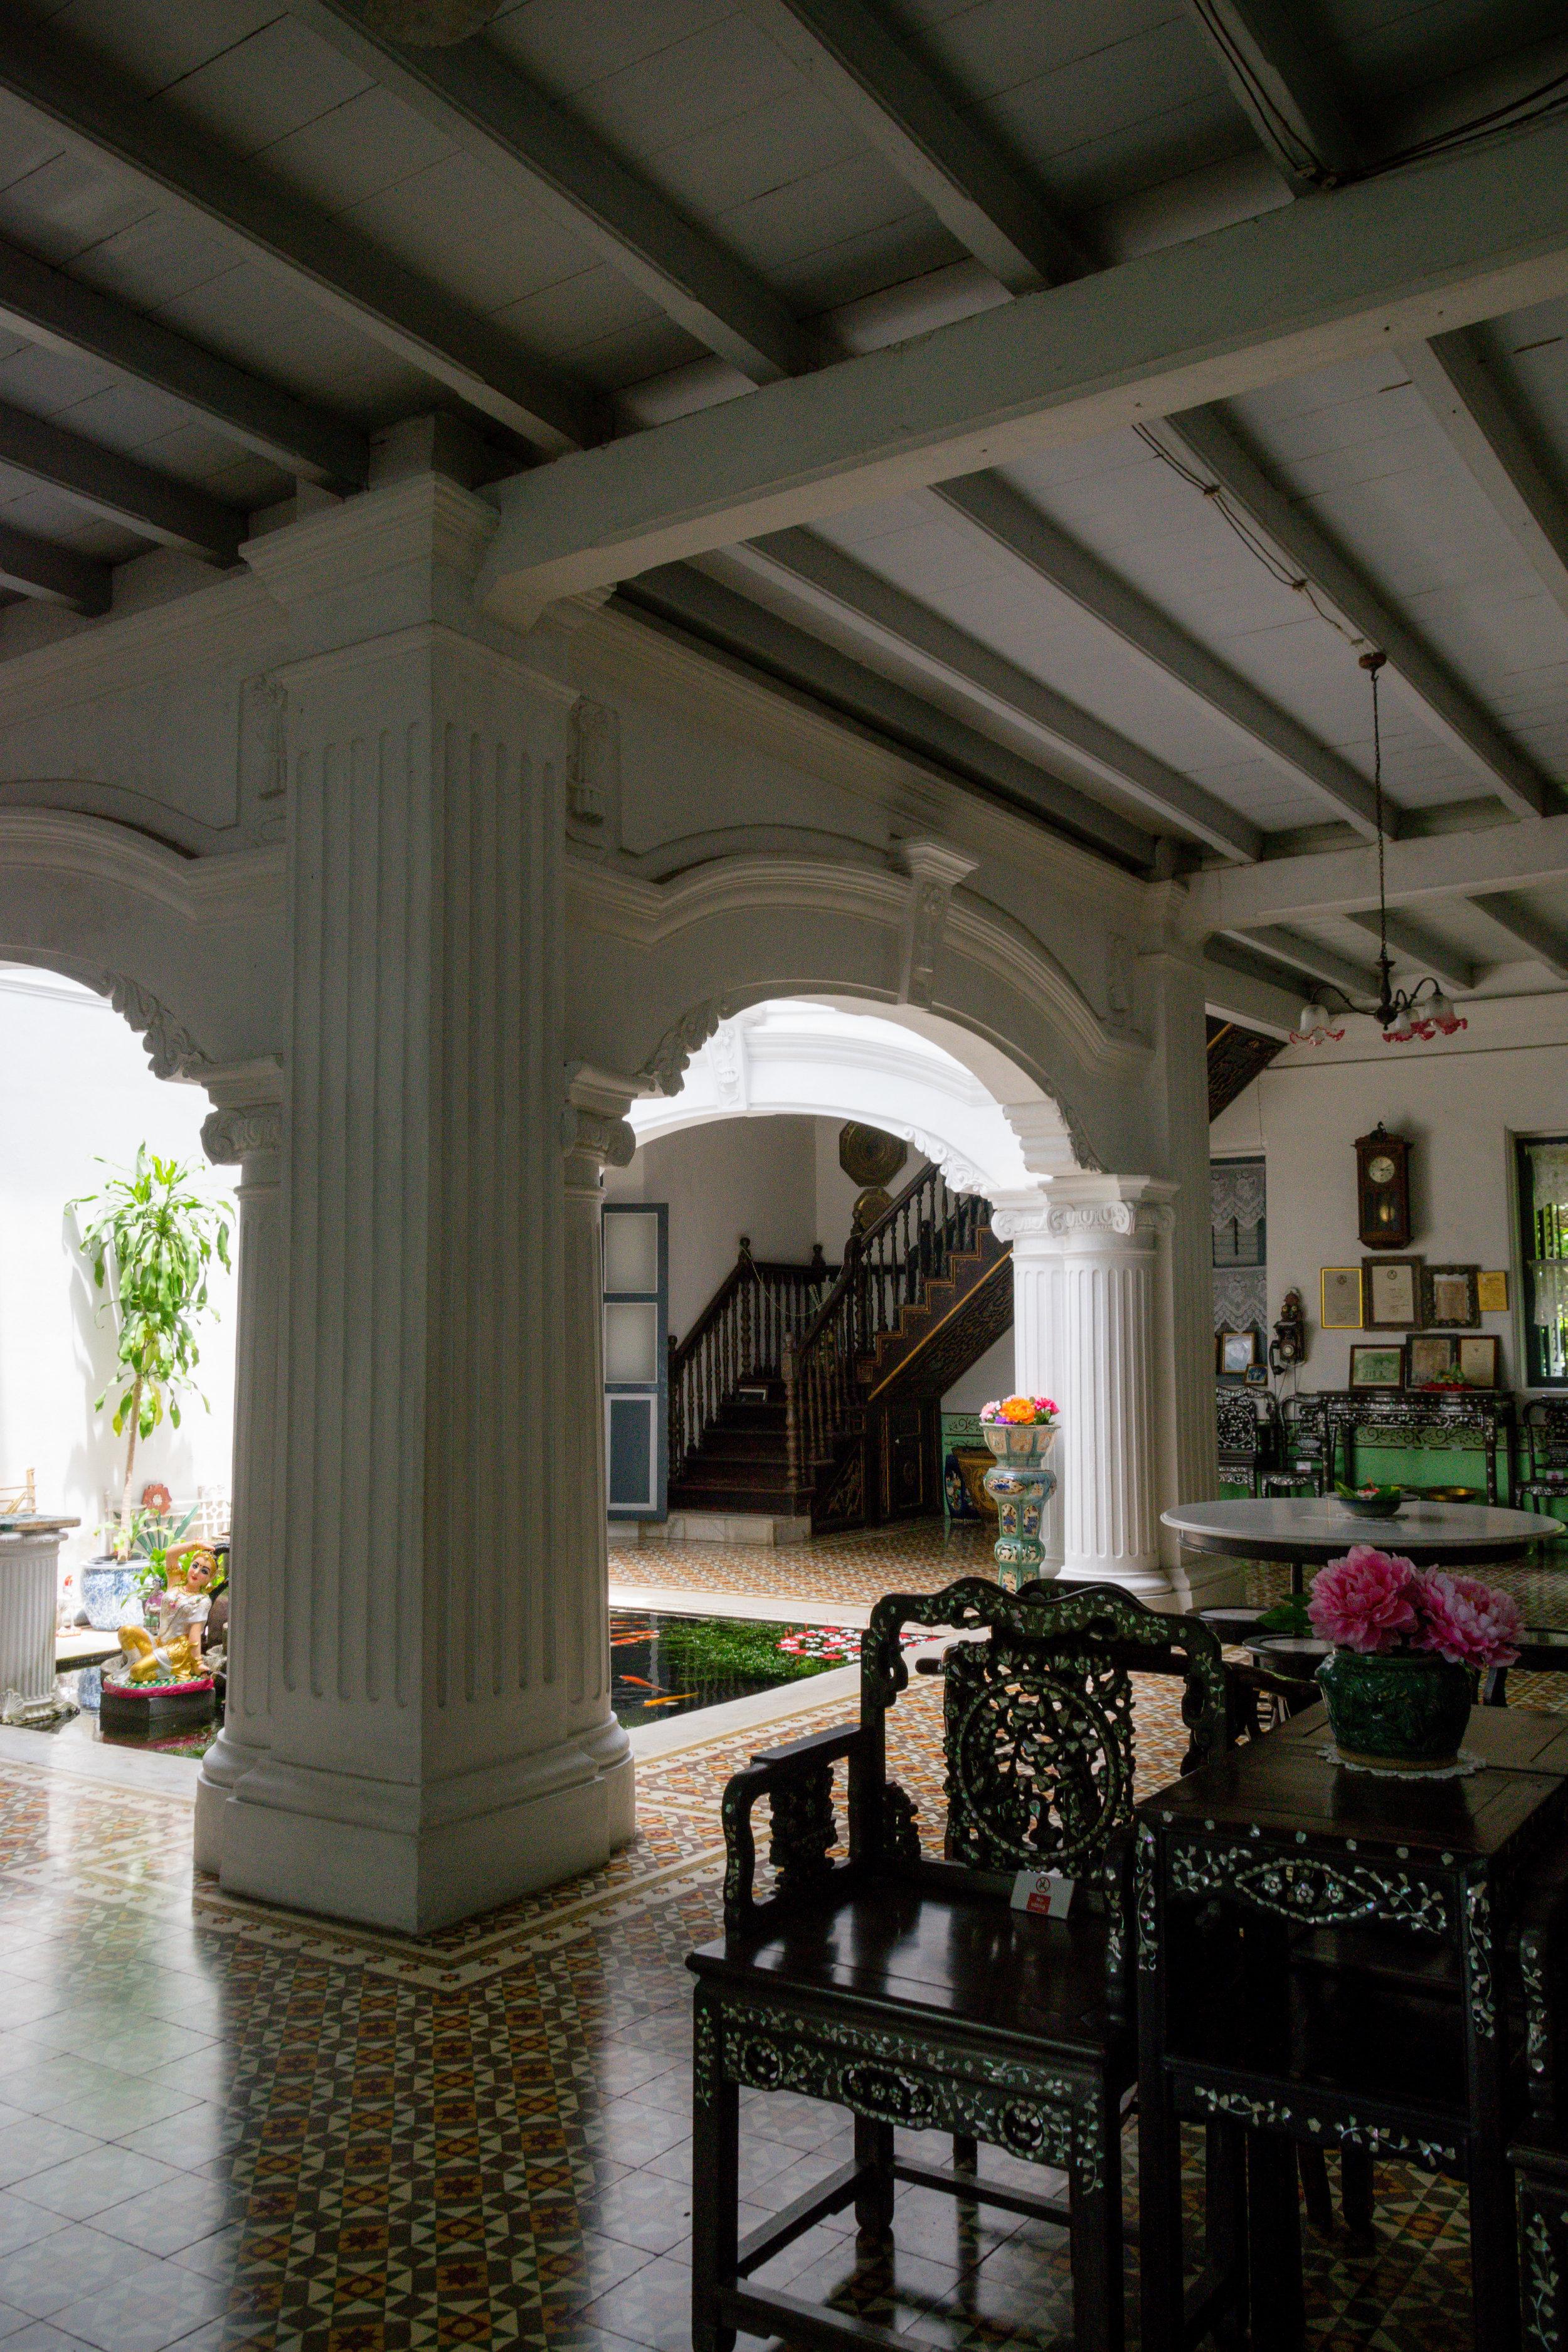 inside Baan Chinpracha